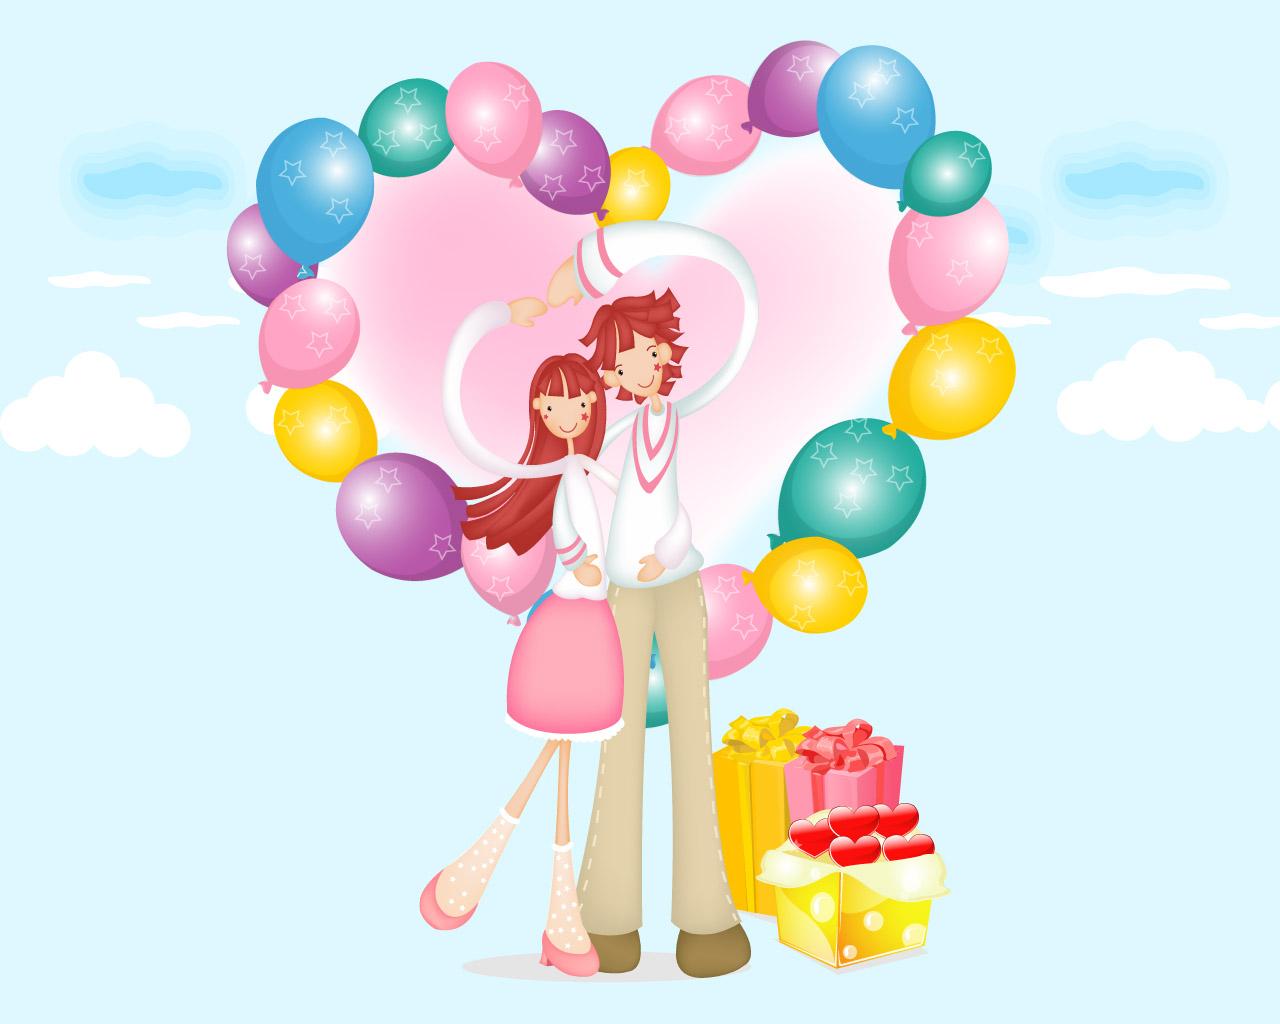 foto gambar kartun romantis koleksi foto kartun romantis kartun untuk